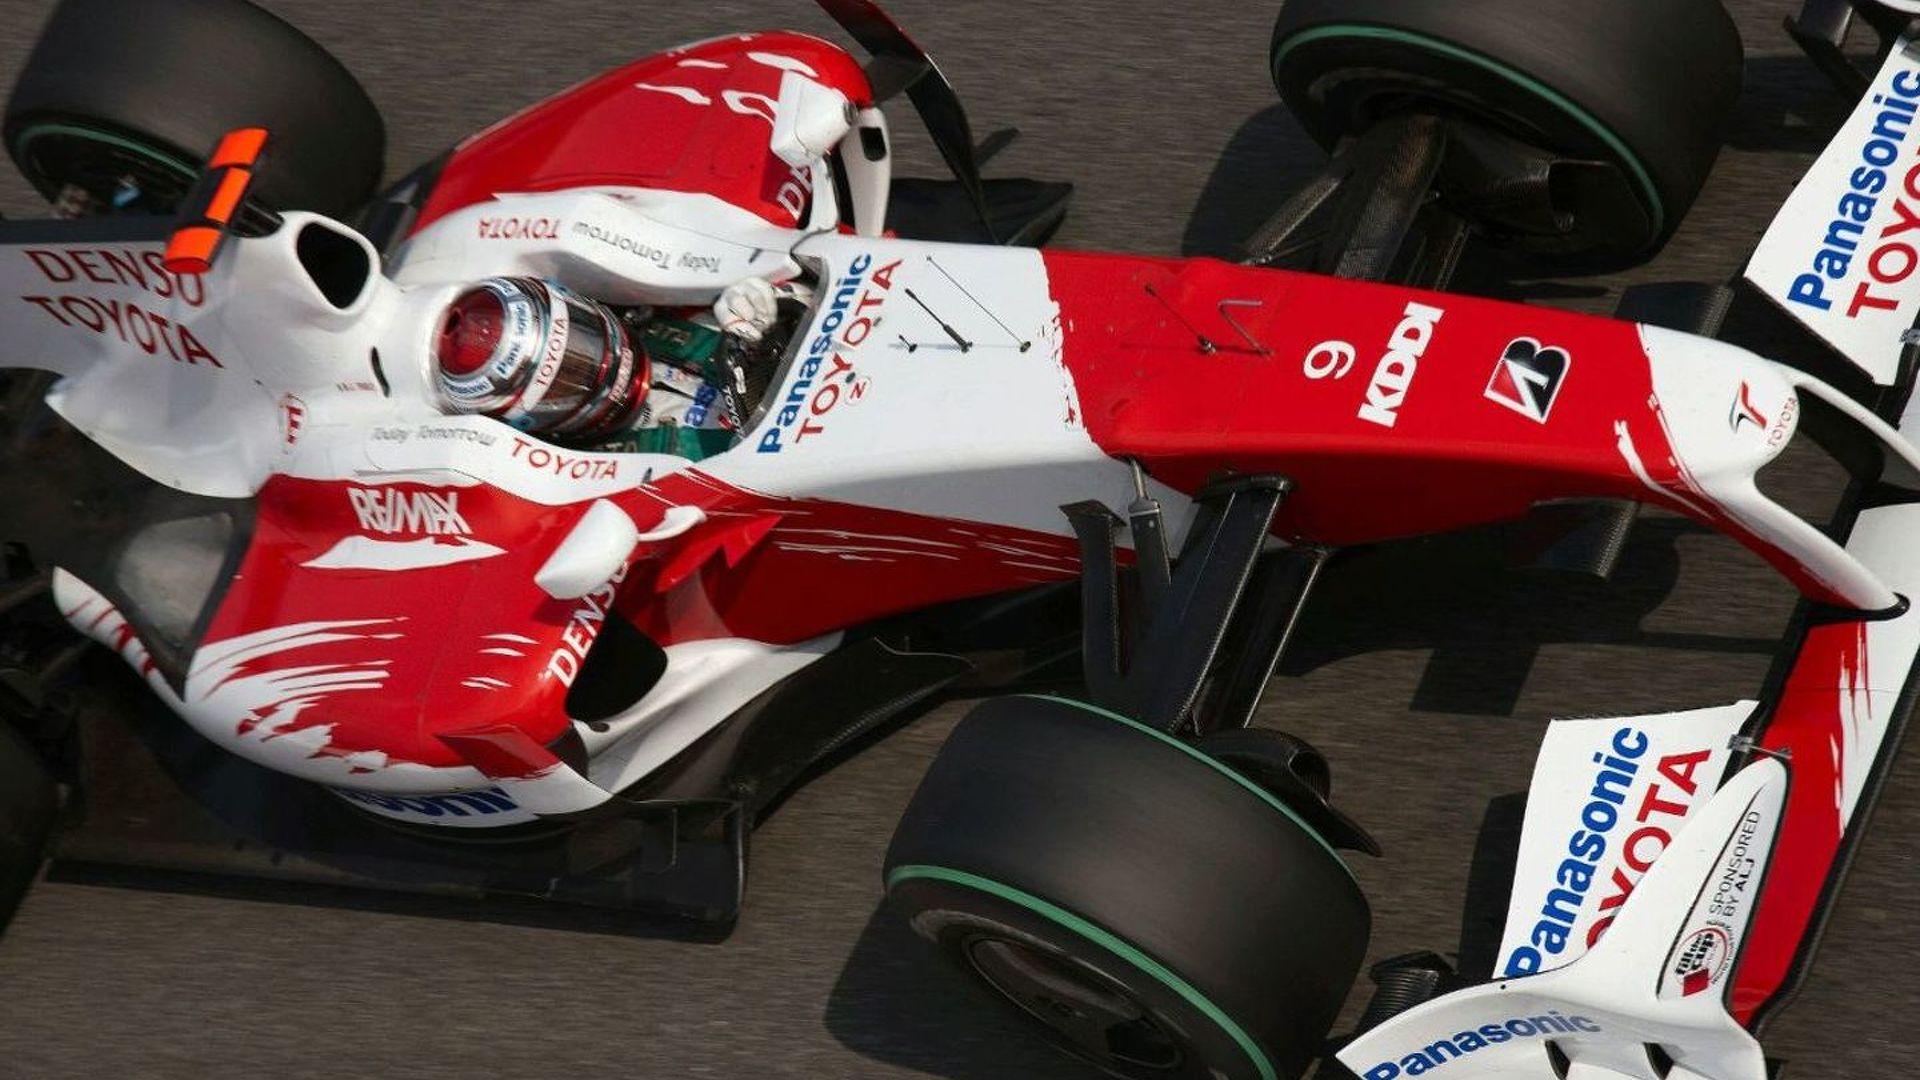 Despite no entry, Stefan GP working on TF110 car